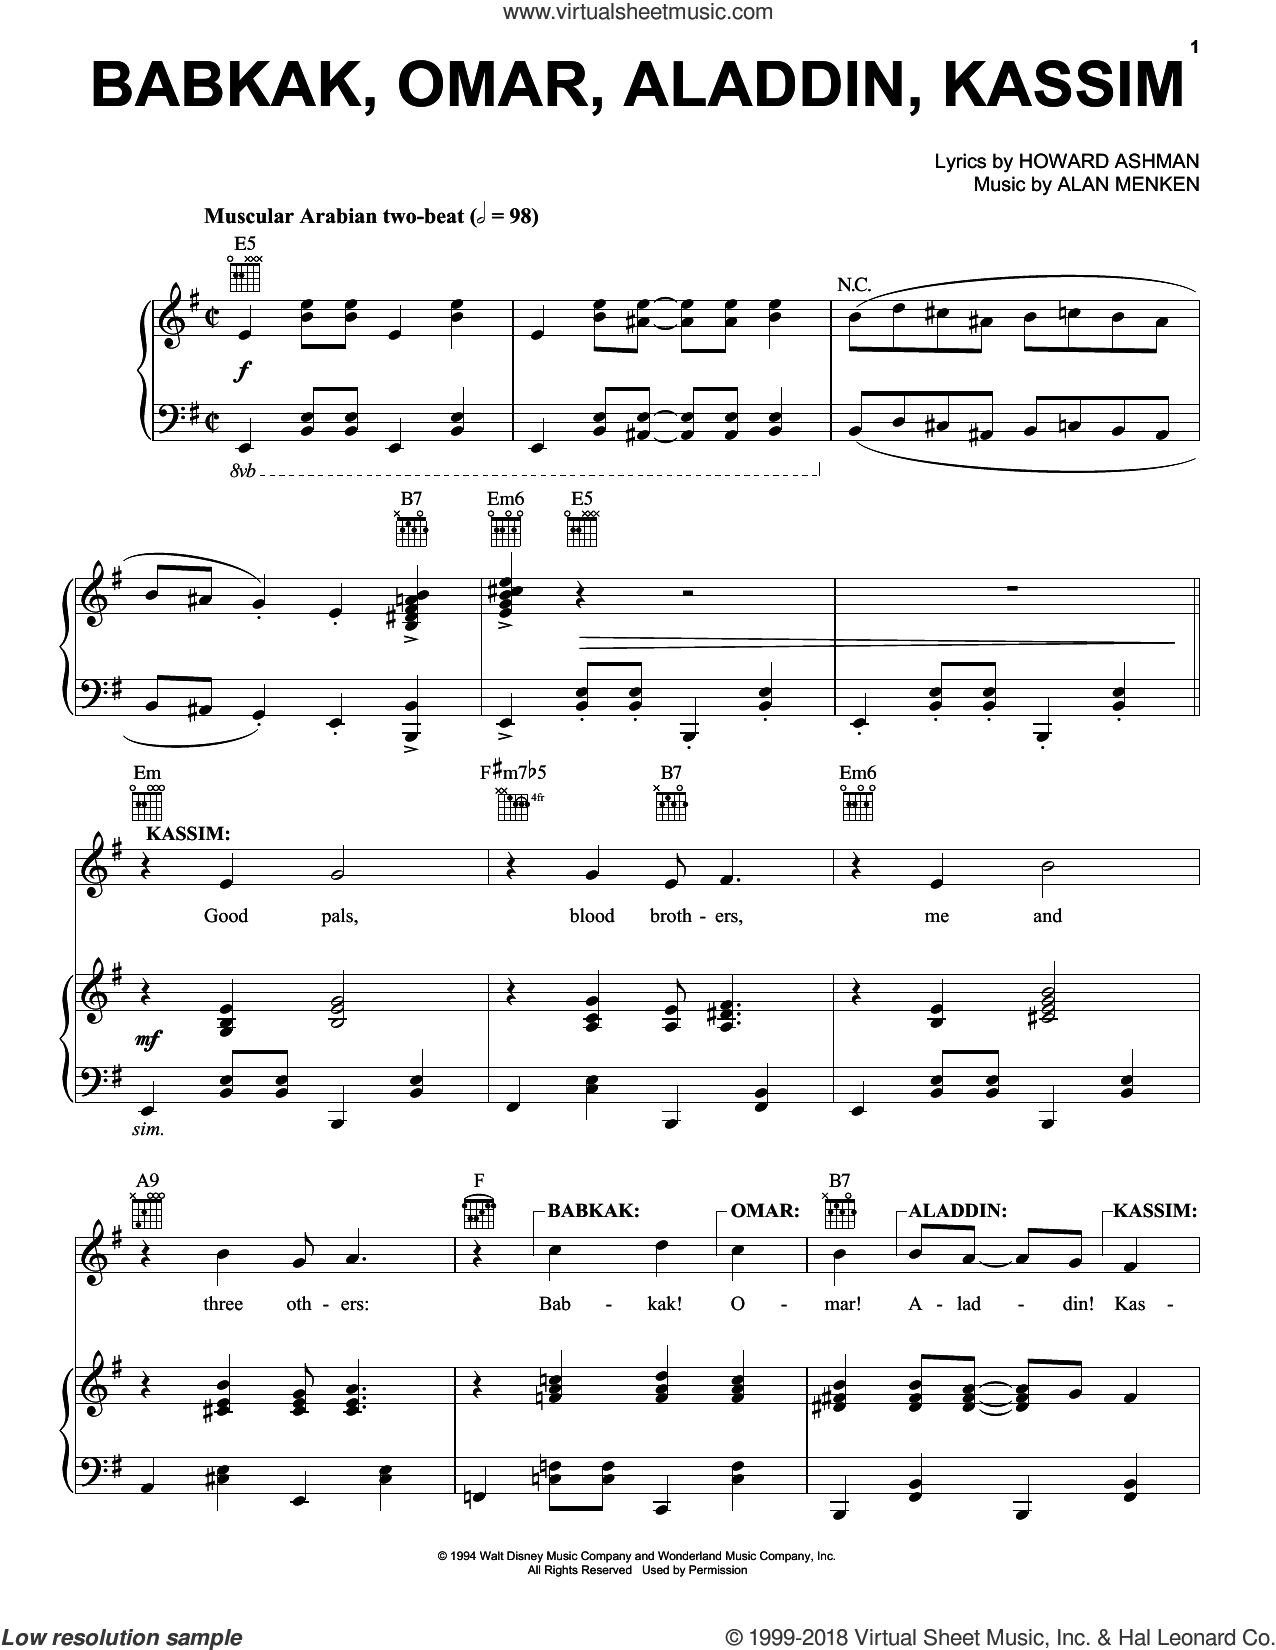 Babkak, Omar, Aladdin, Kassim (from Aladdin: The Broadway Musical) sheet music for voice, piano or guitar by Alan Menken and Howard Ashman, intermediate skill level